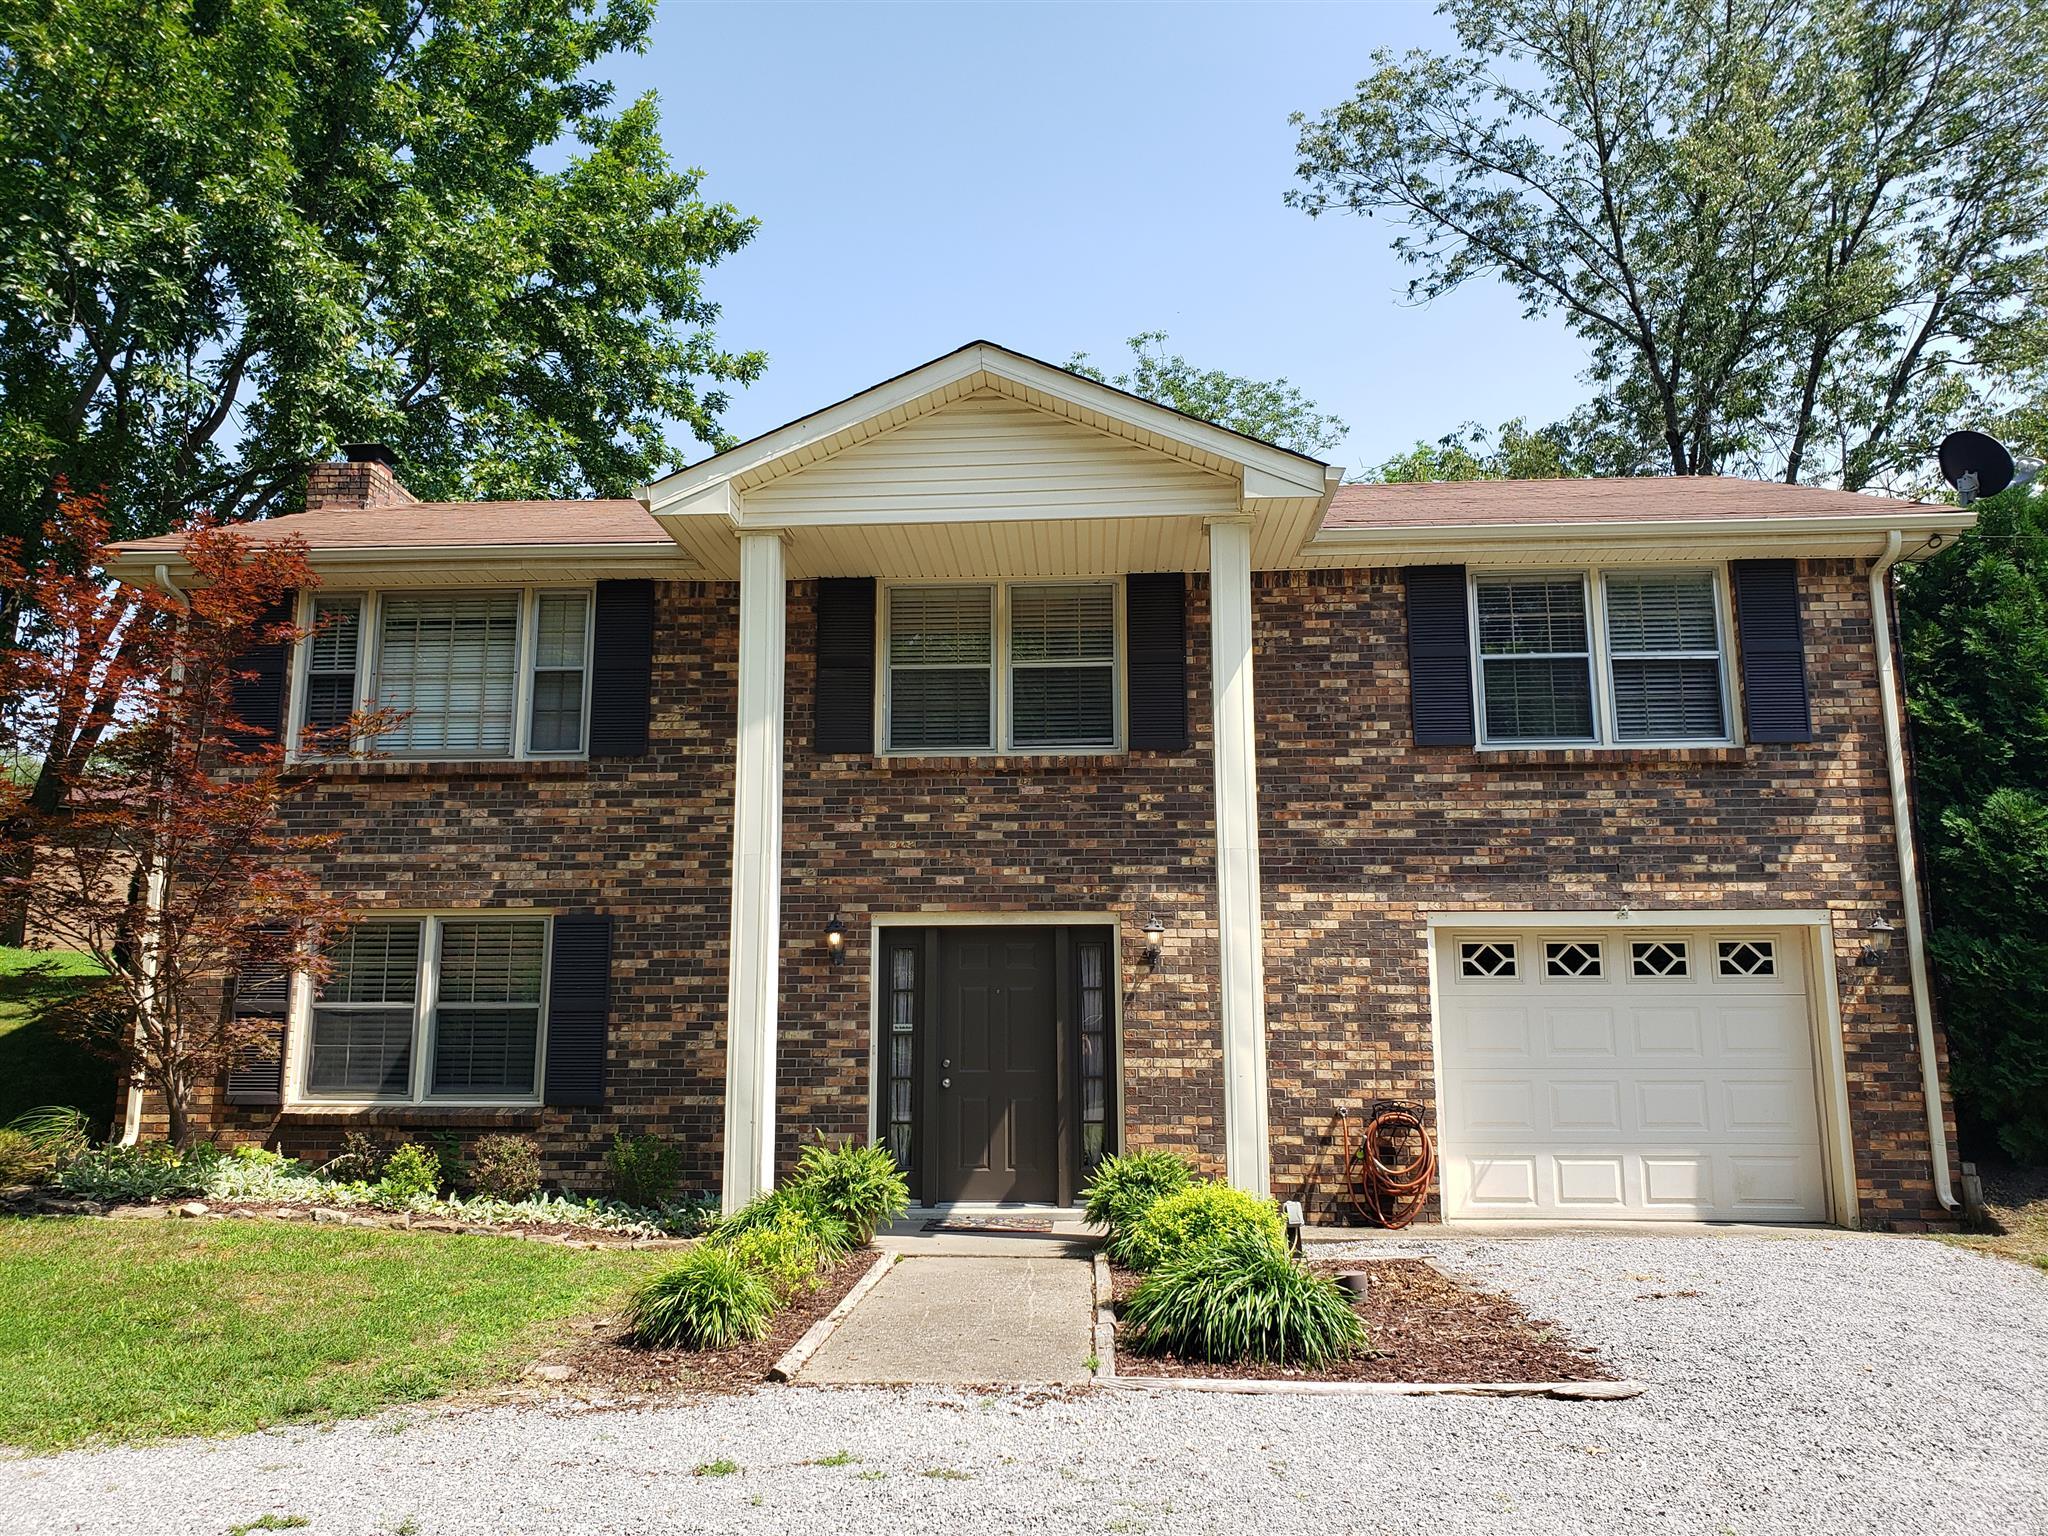 340 Harold Dr, NE, Clarksville, TN 37040 - Clarksville, TN real estate listing